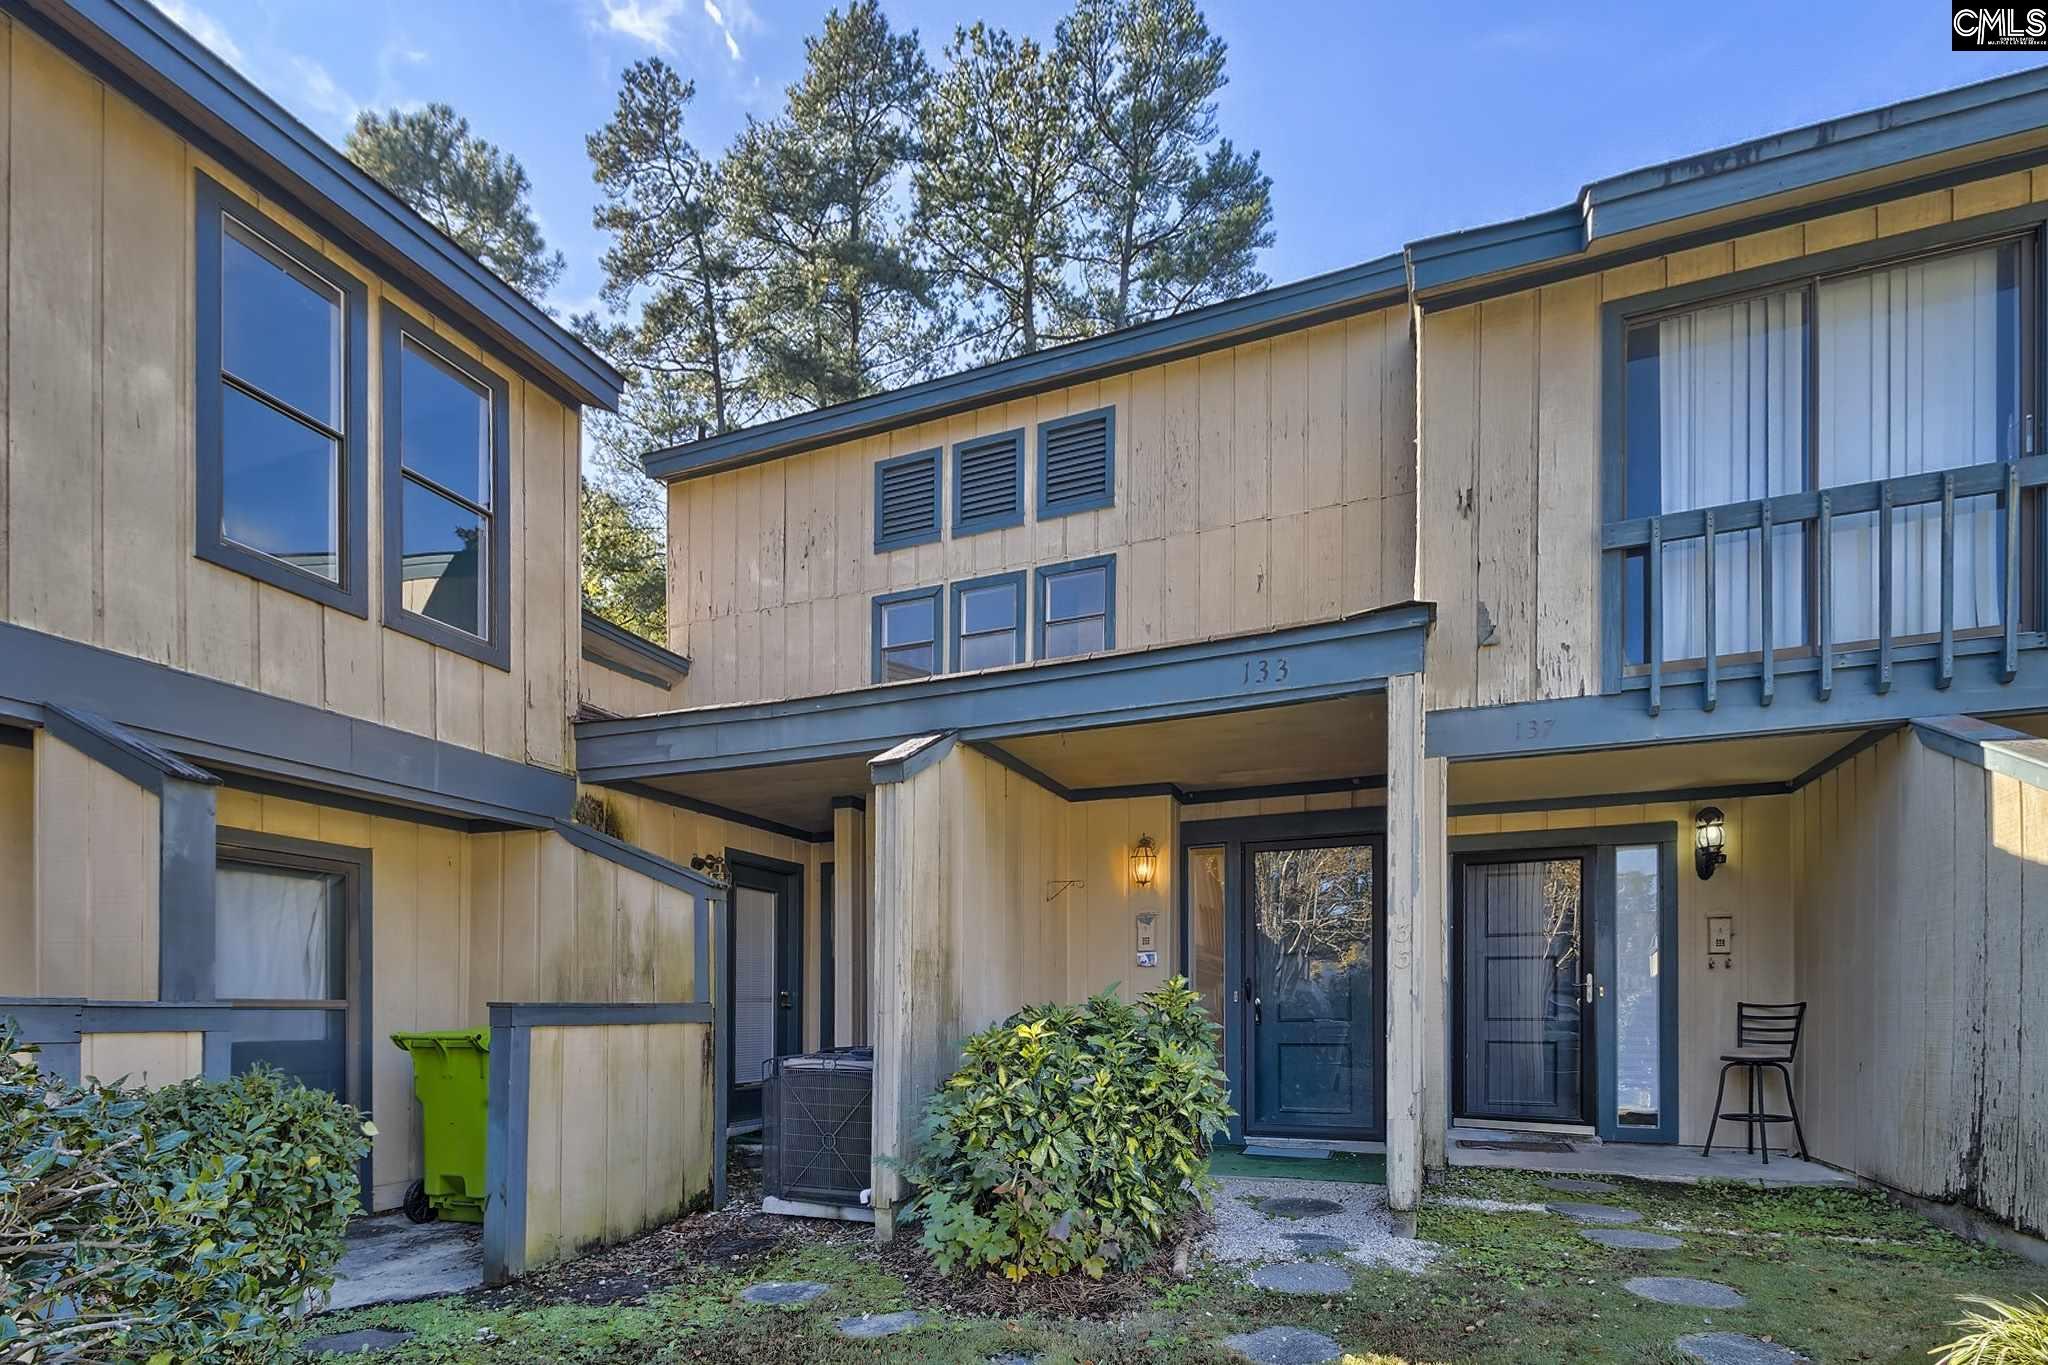 133 Wood Columbia, SC 29210-4645